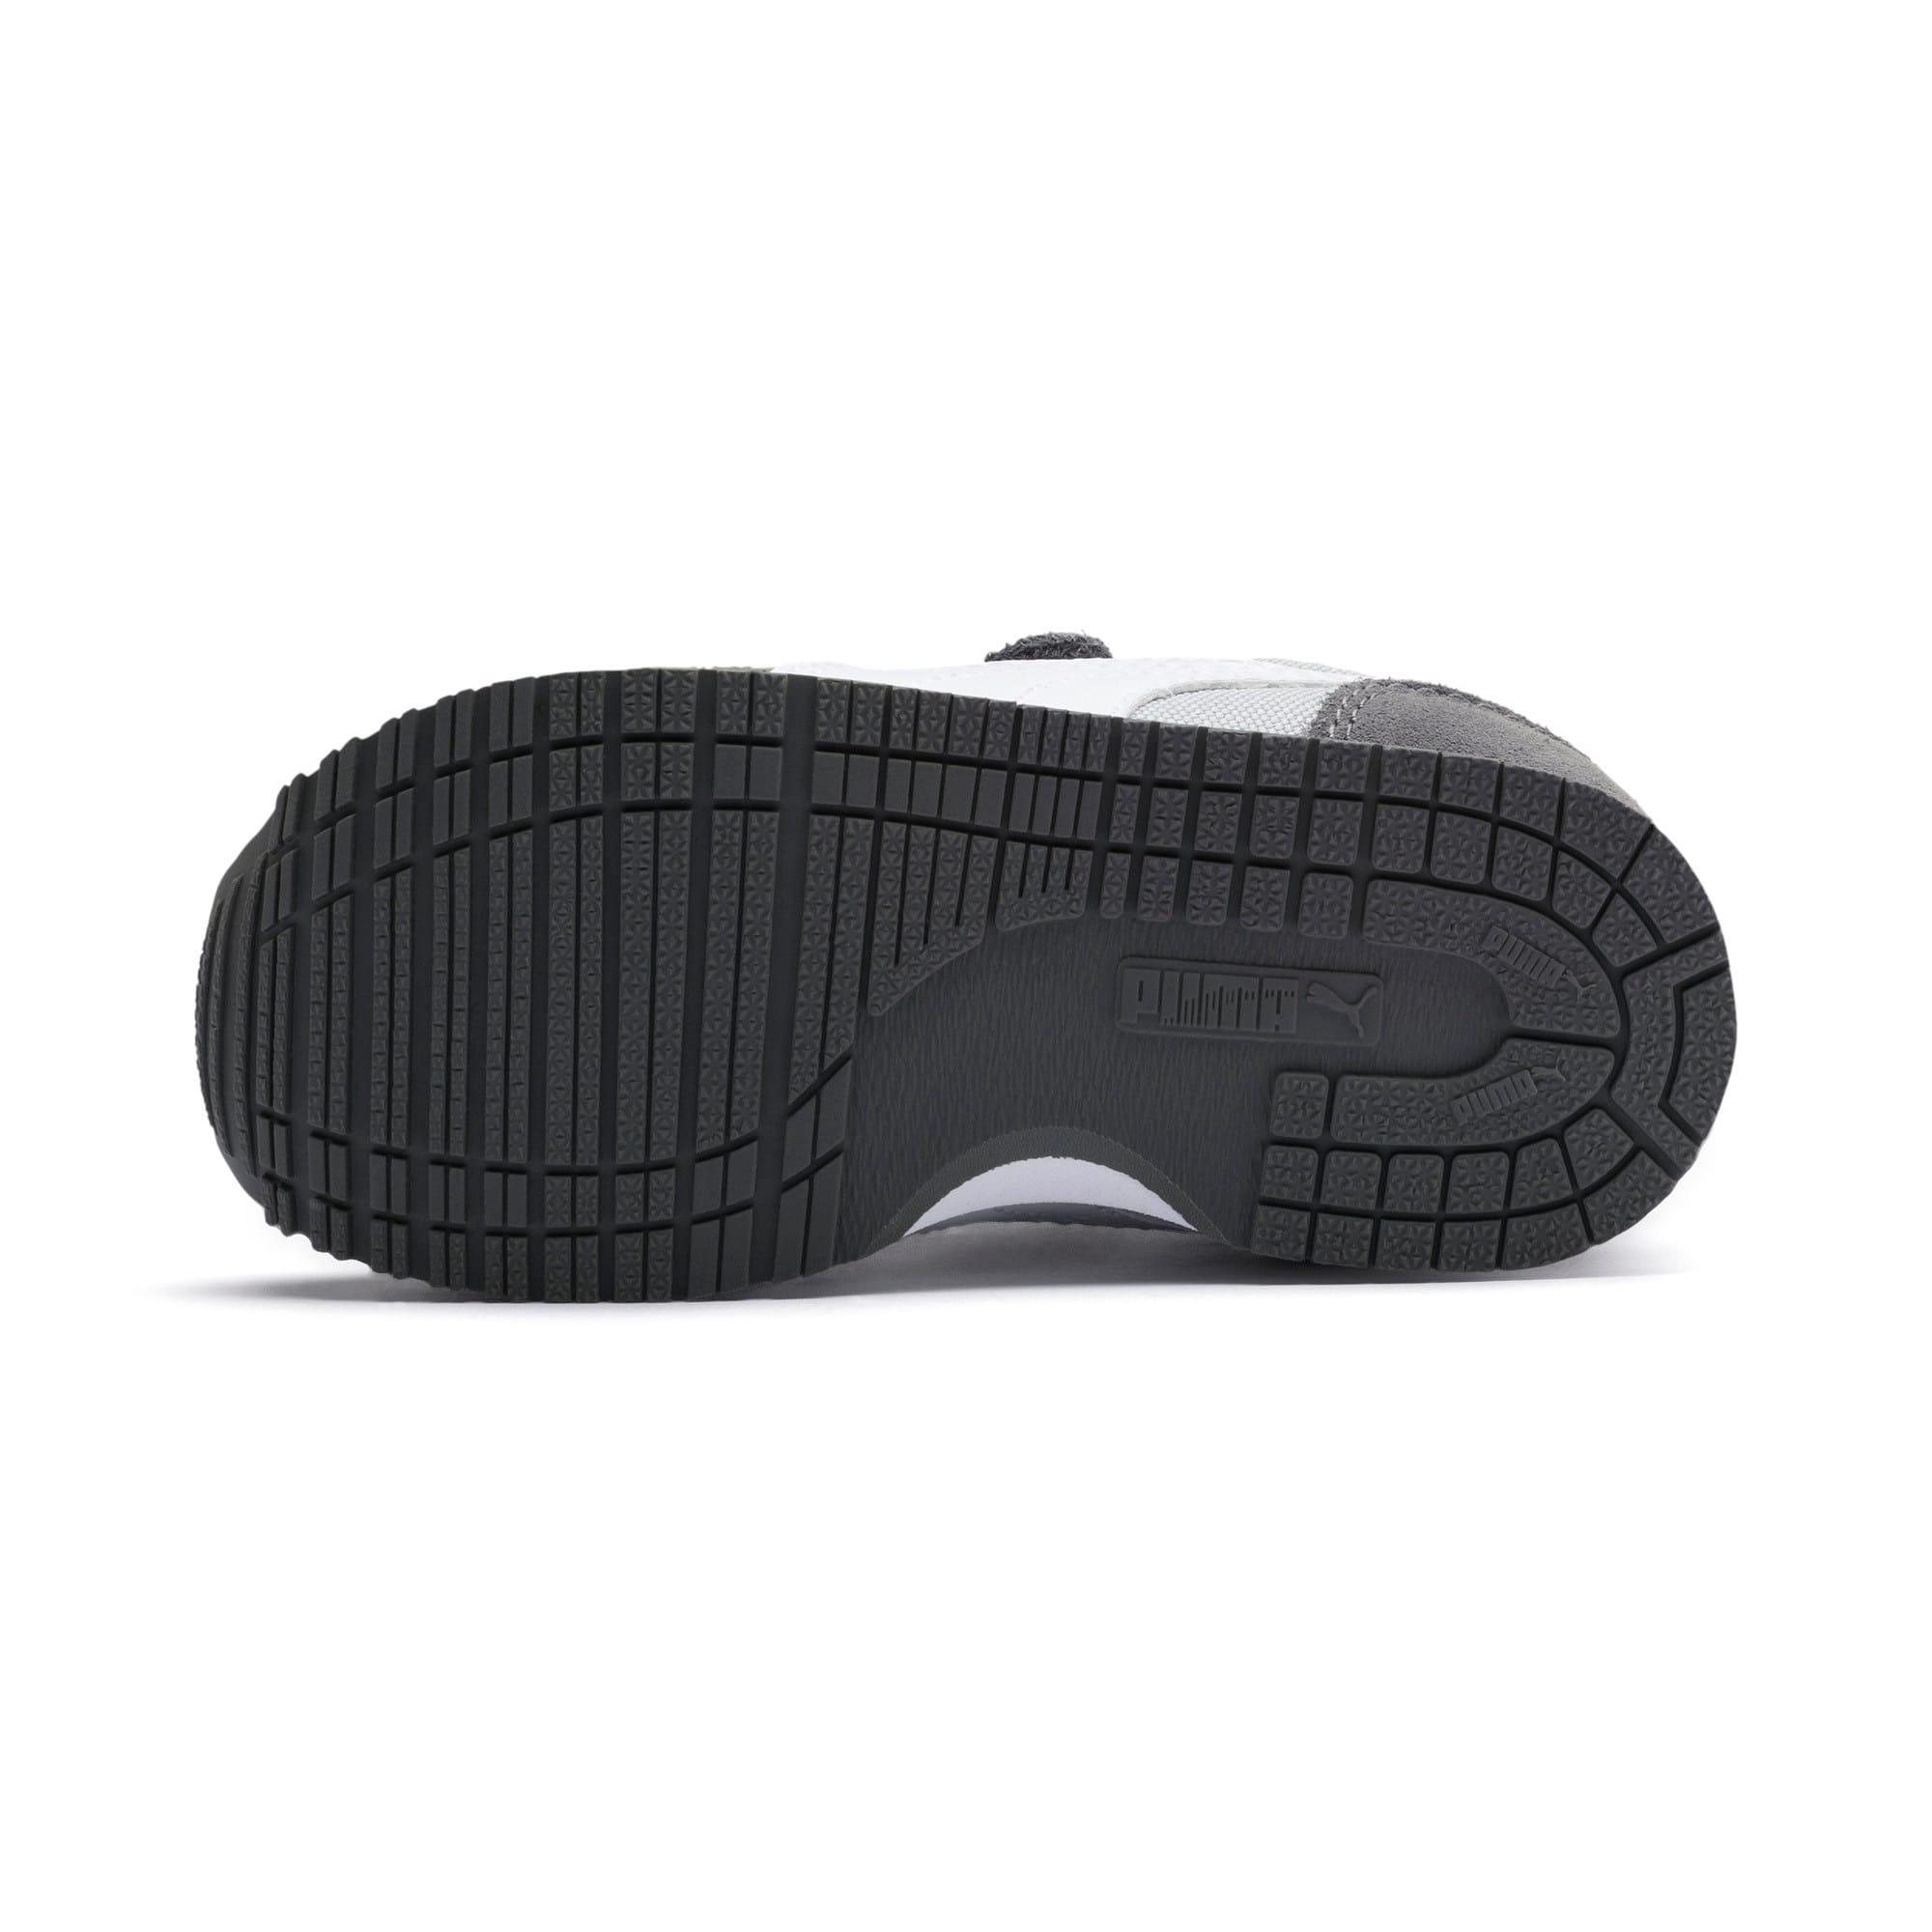 Thumbnail 4 of Cabana Racer Toddler Shoes, High Rise-CASTLEROCK, medium